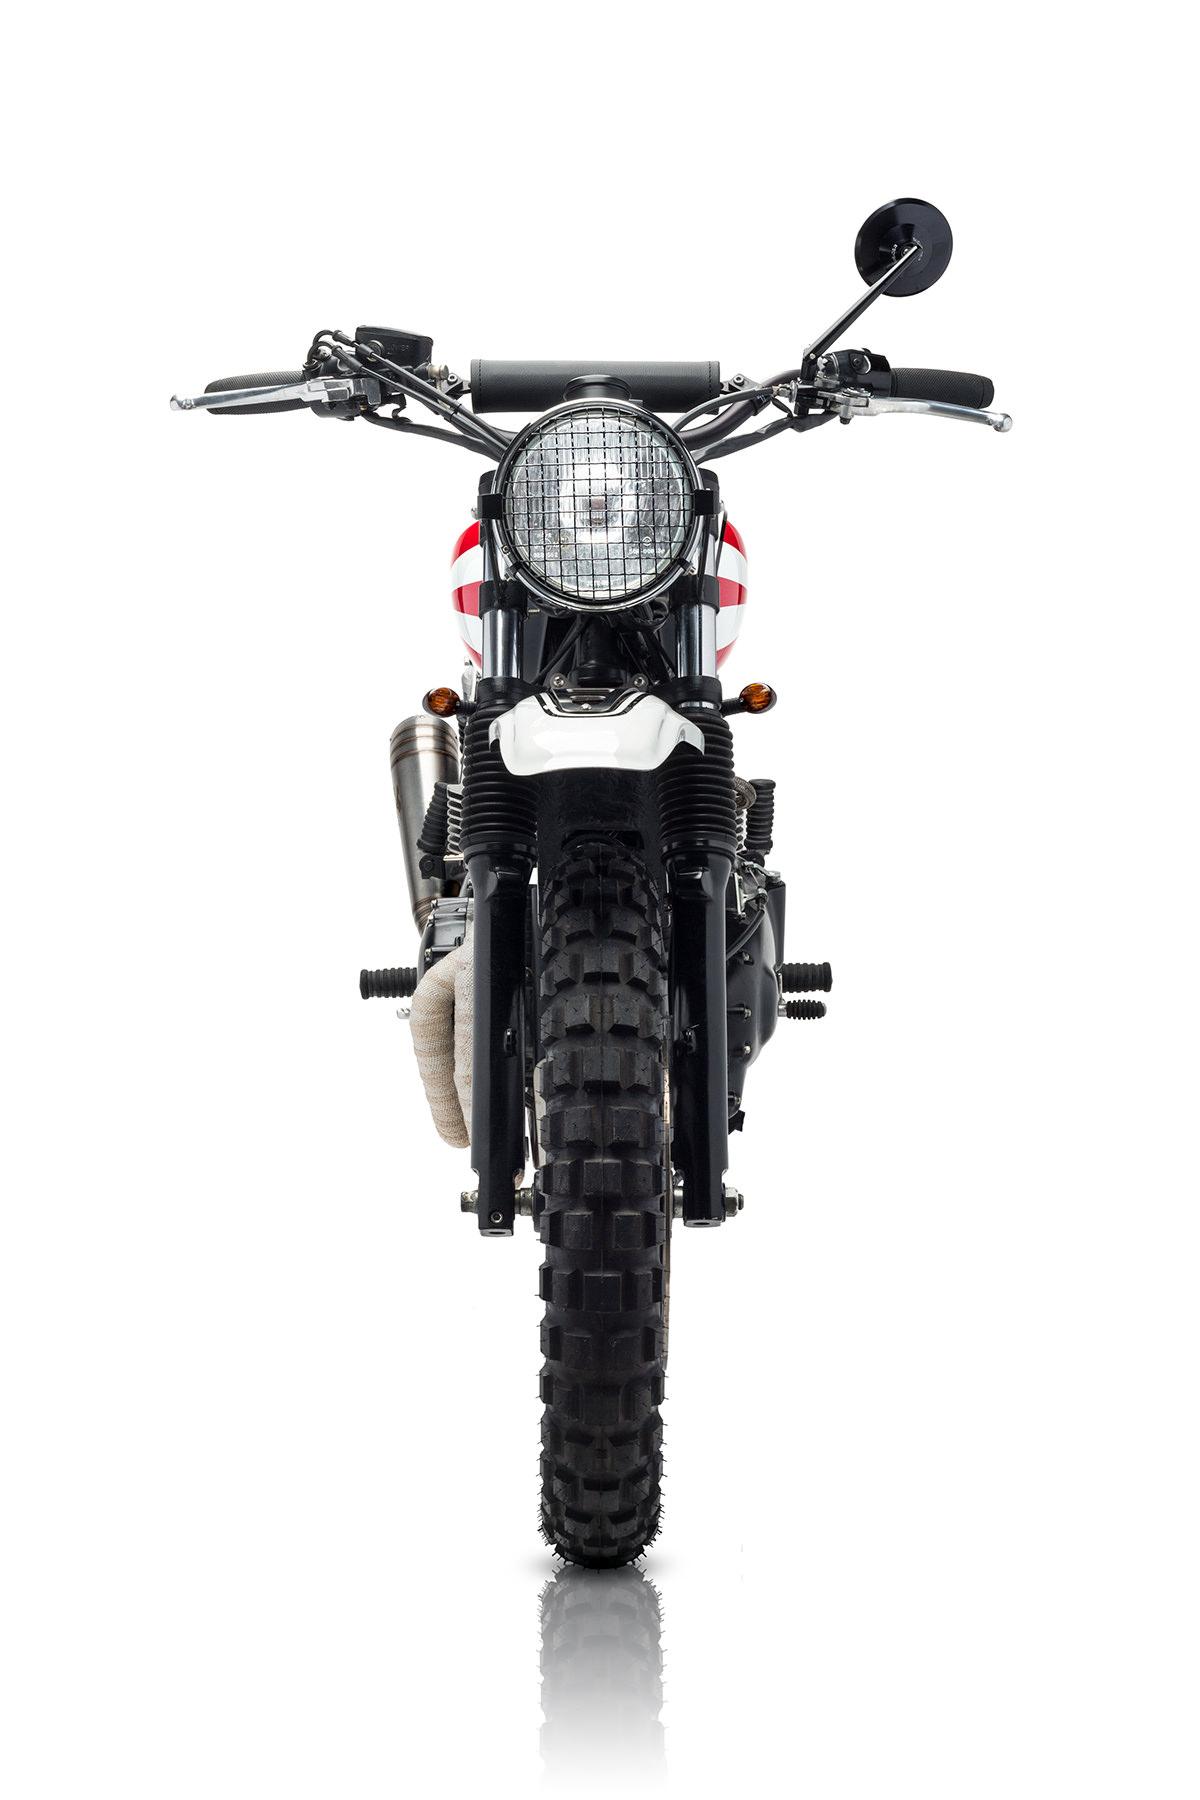 Custom Triumph Scrambler Motorcycle 7